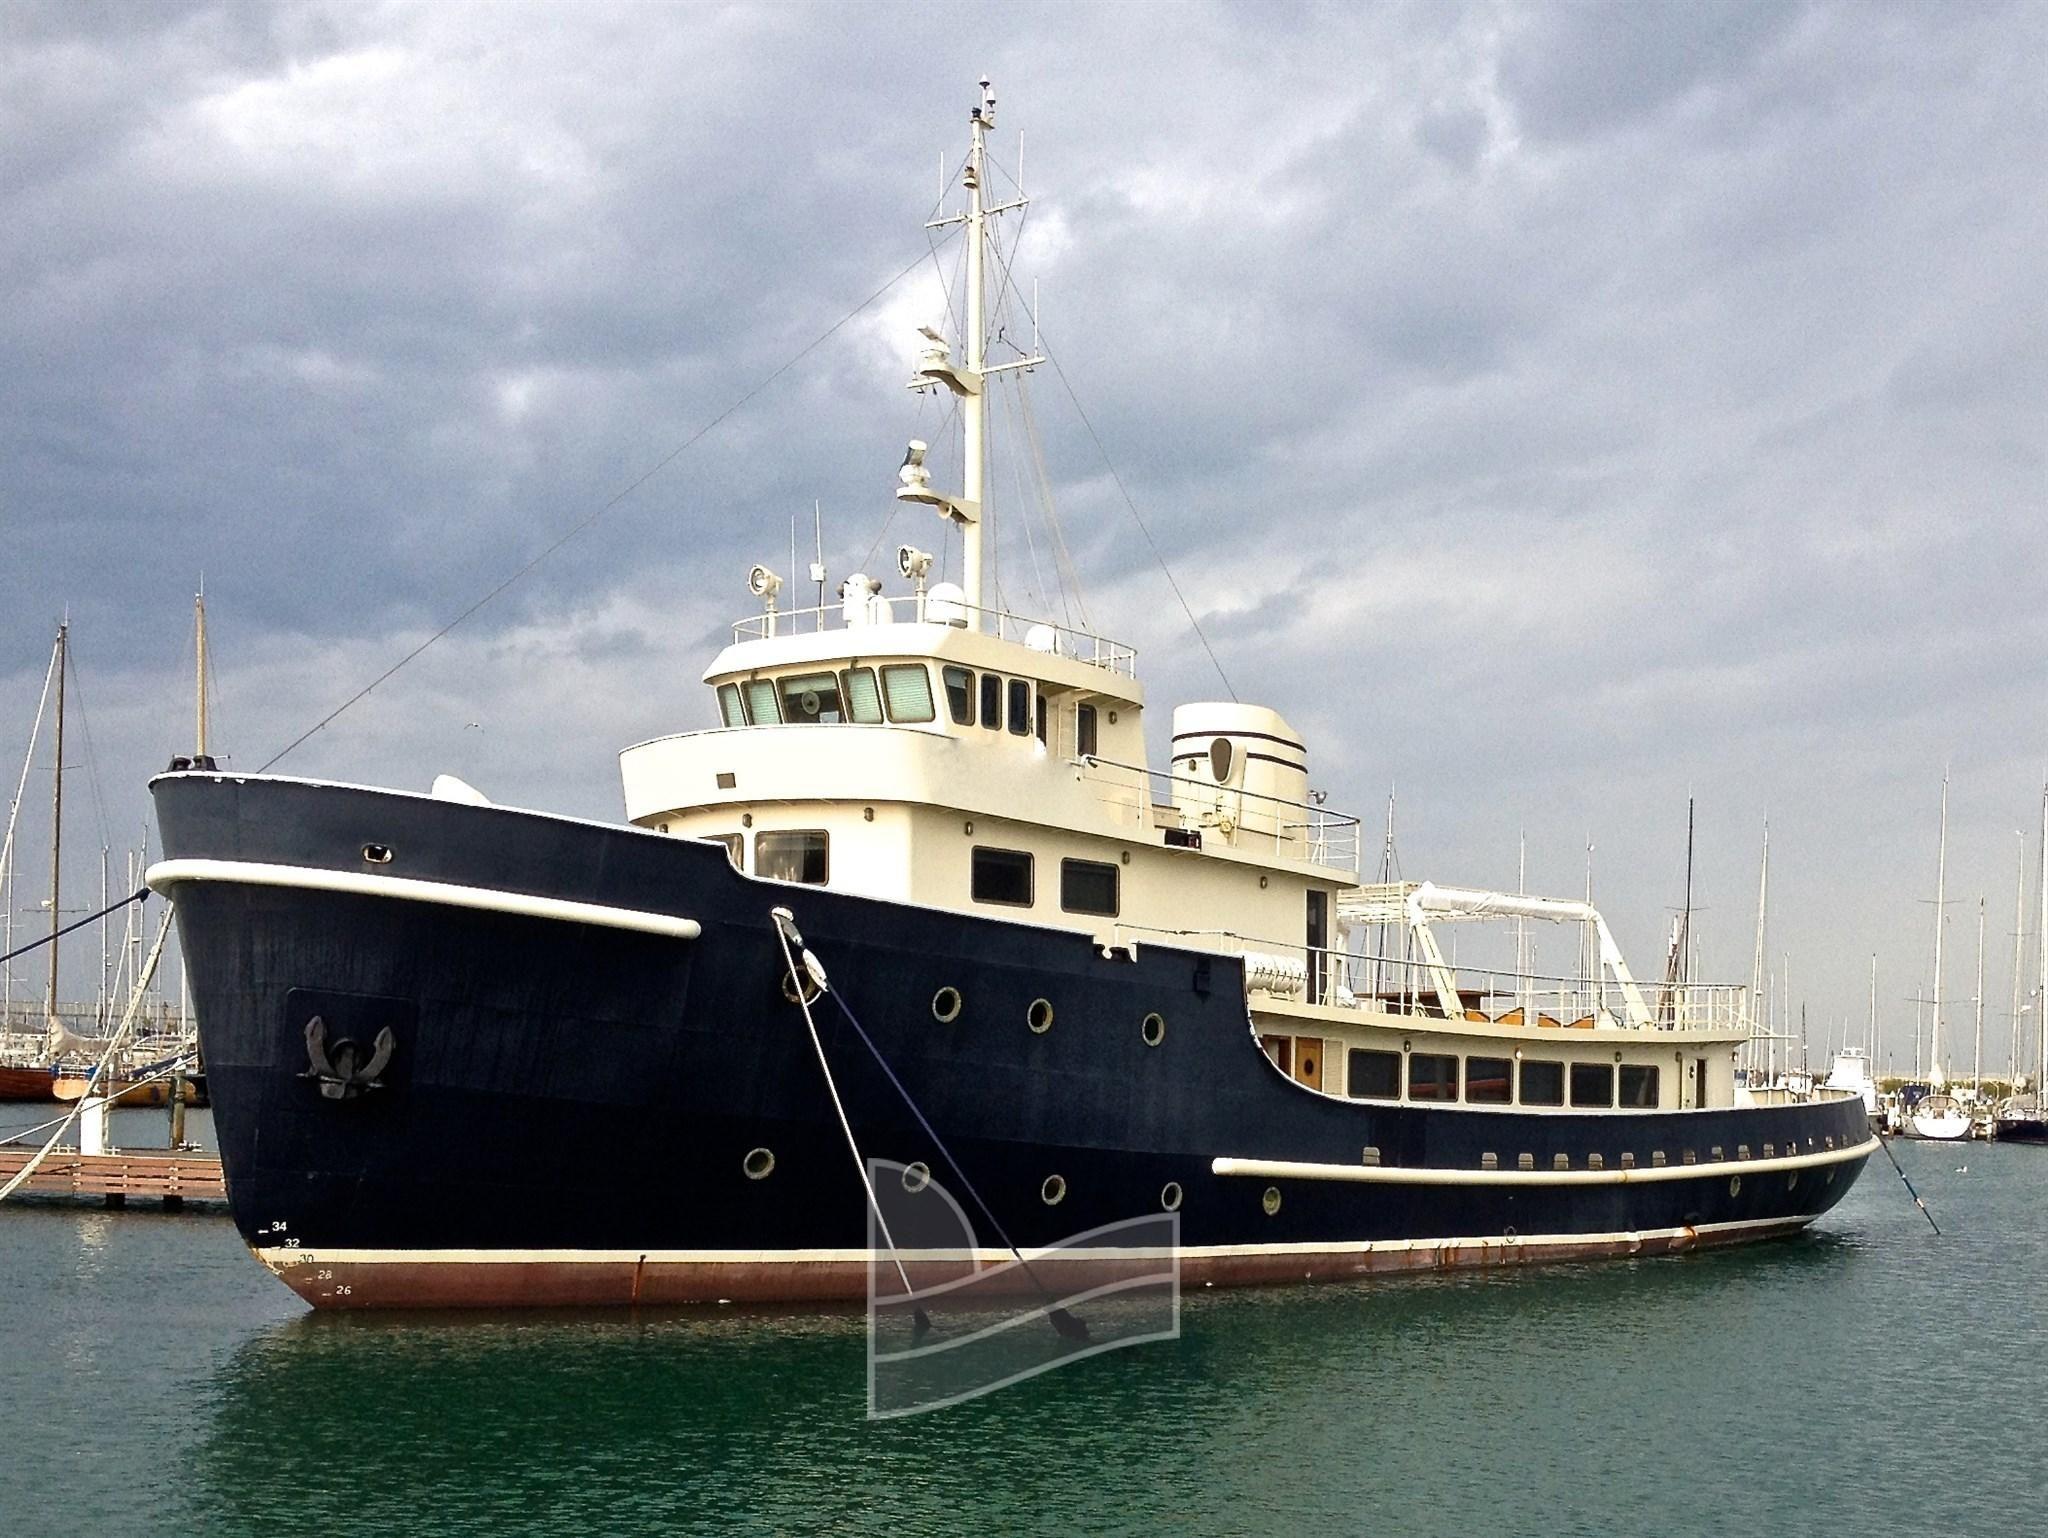 1957 Custom Cantiere Santiebul Navetta Power Boat For Sale